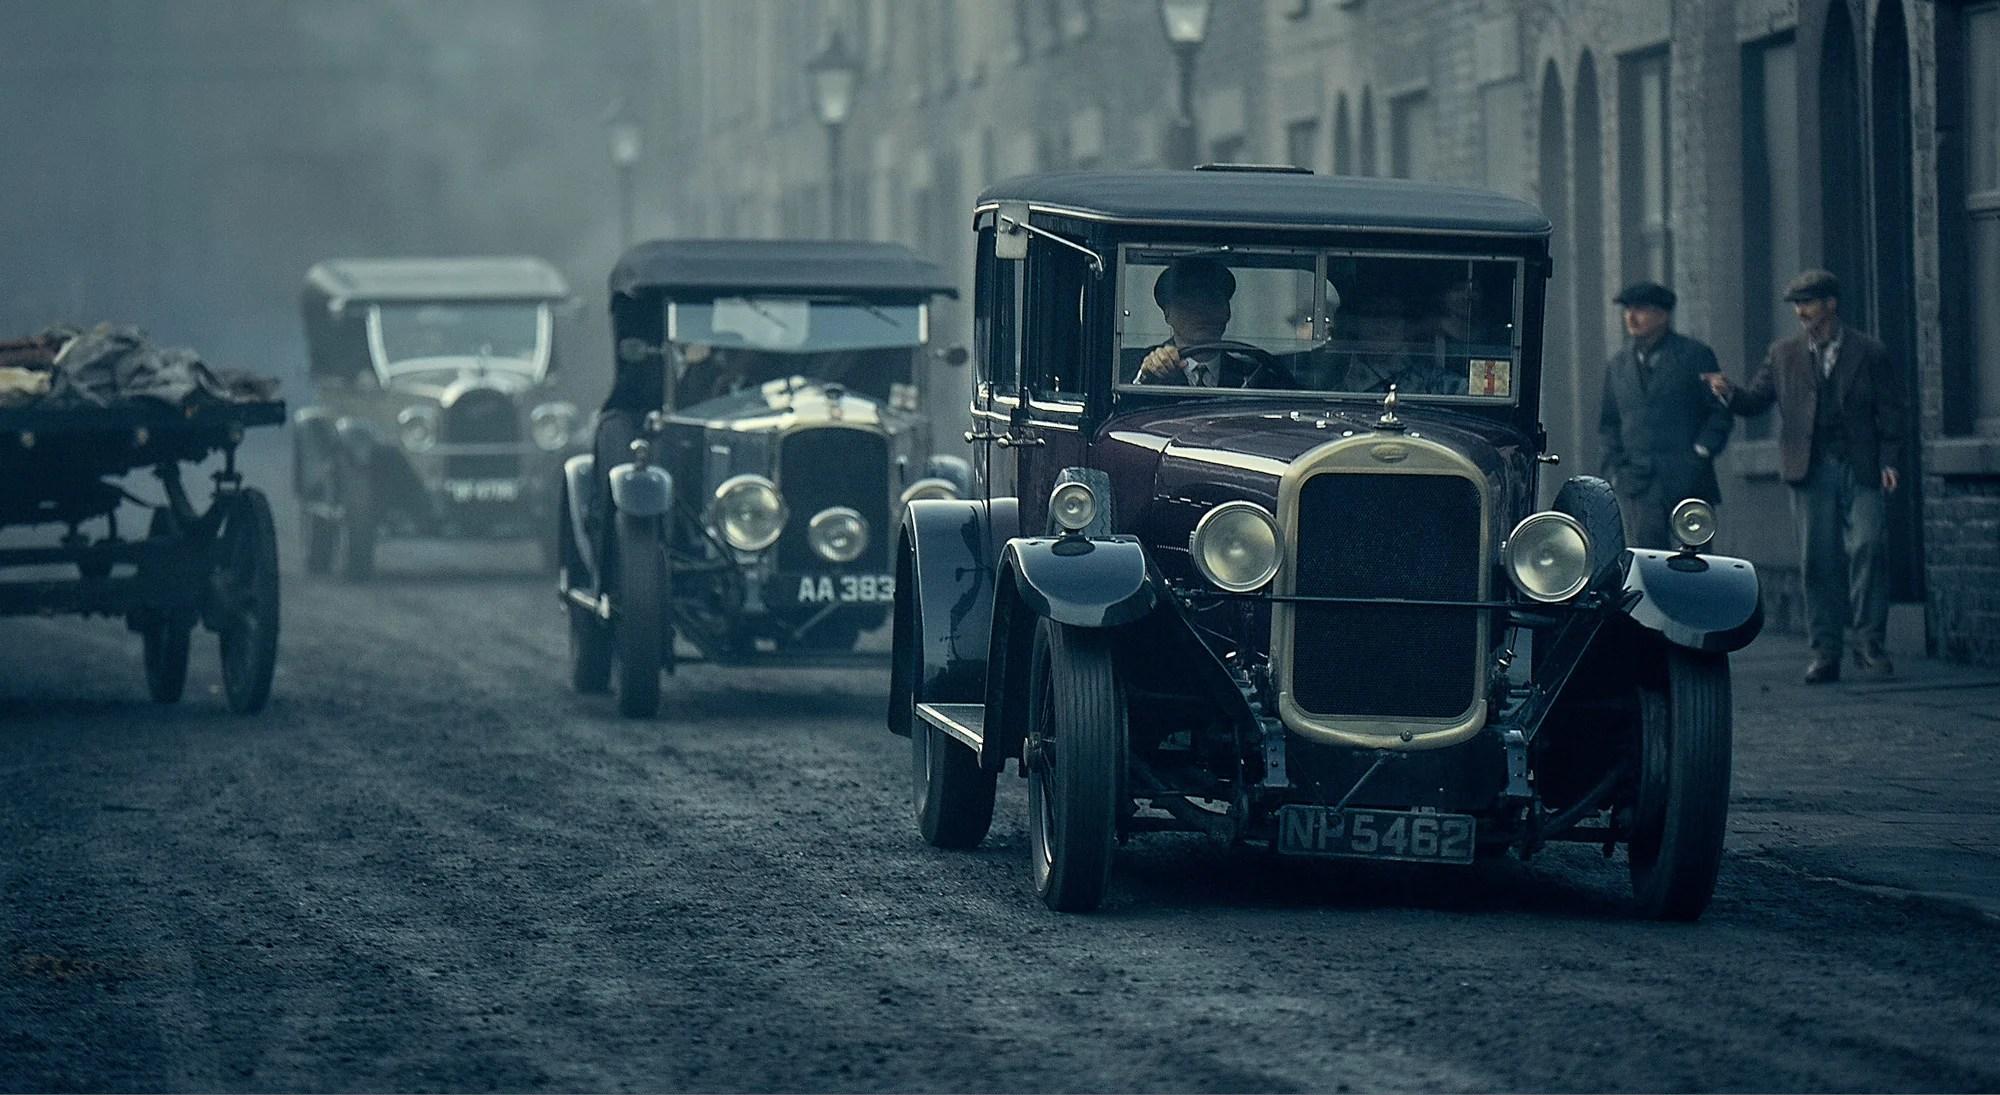 Antique Cars Wallpaper Hd Peaky Blinders Movie Could Happen Julia Roberts